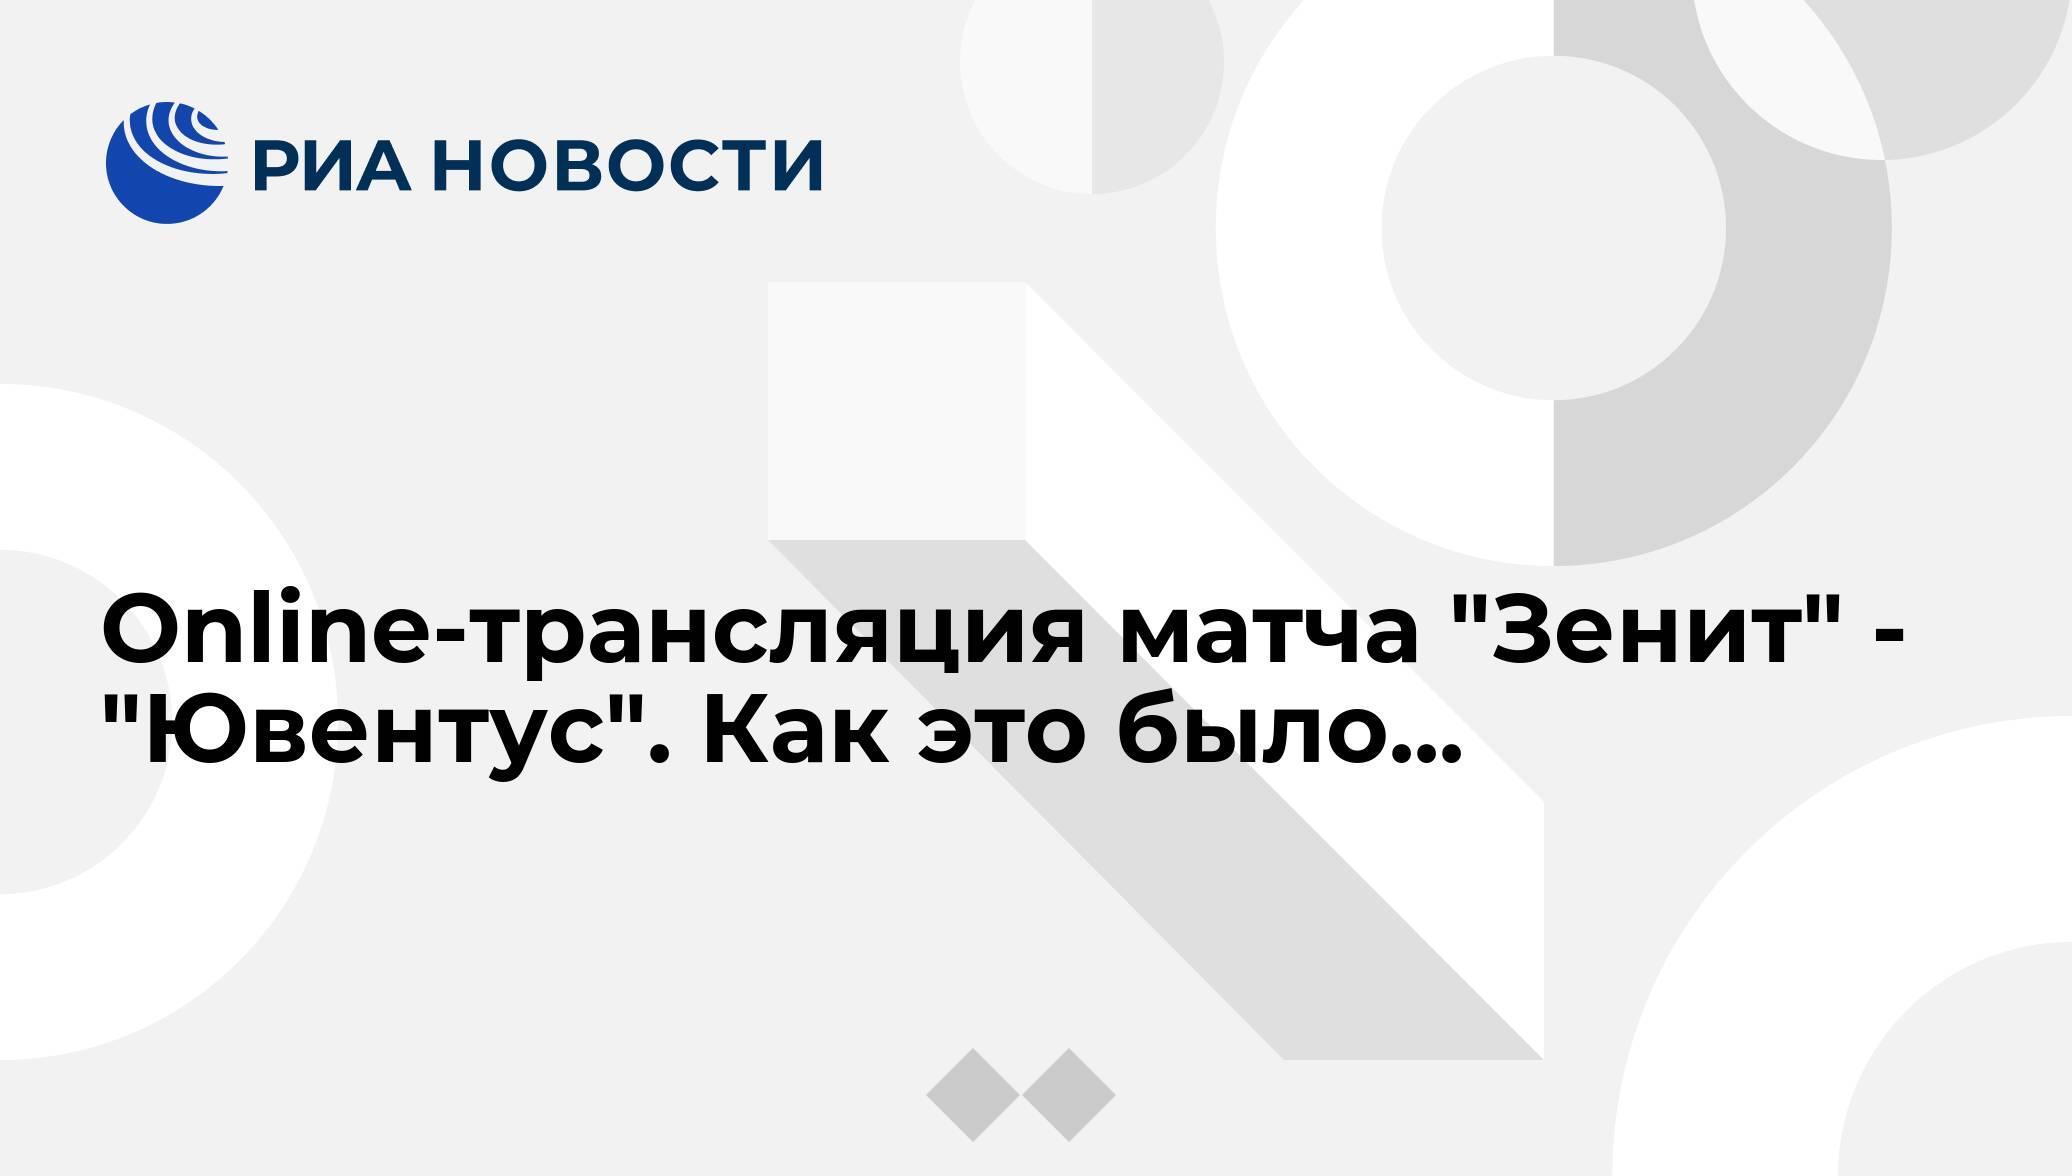 Online транслЯциЯ зенит ювентус